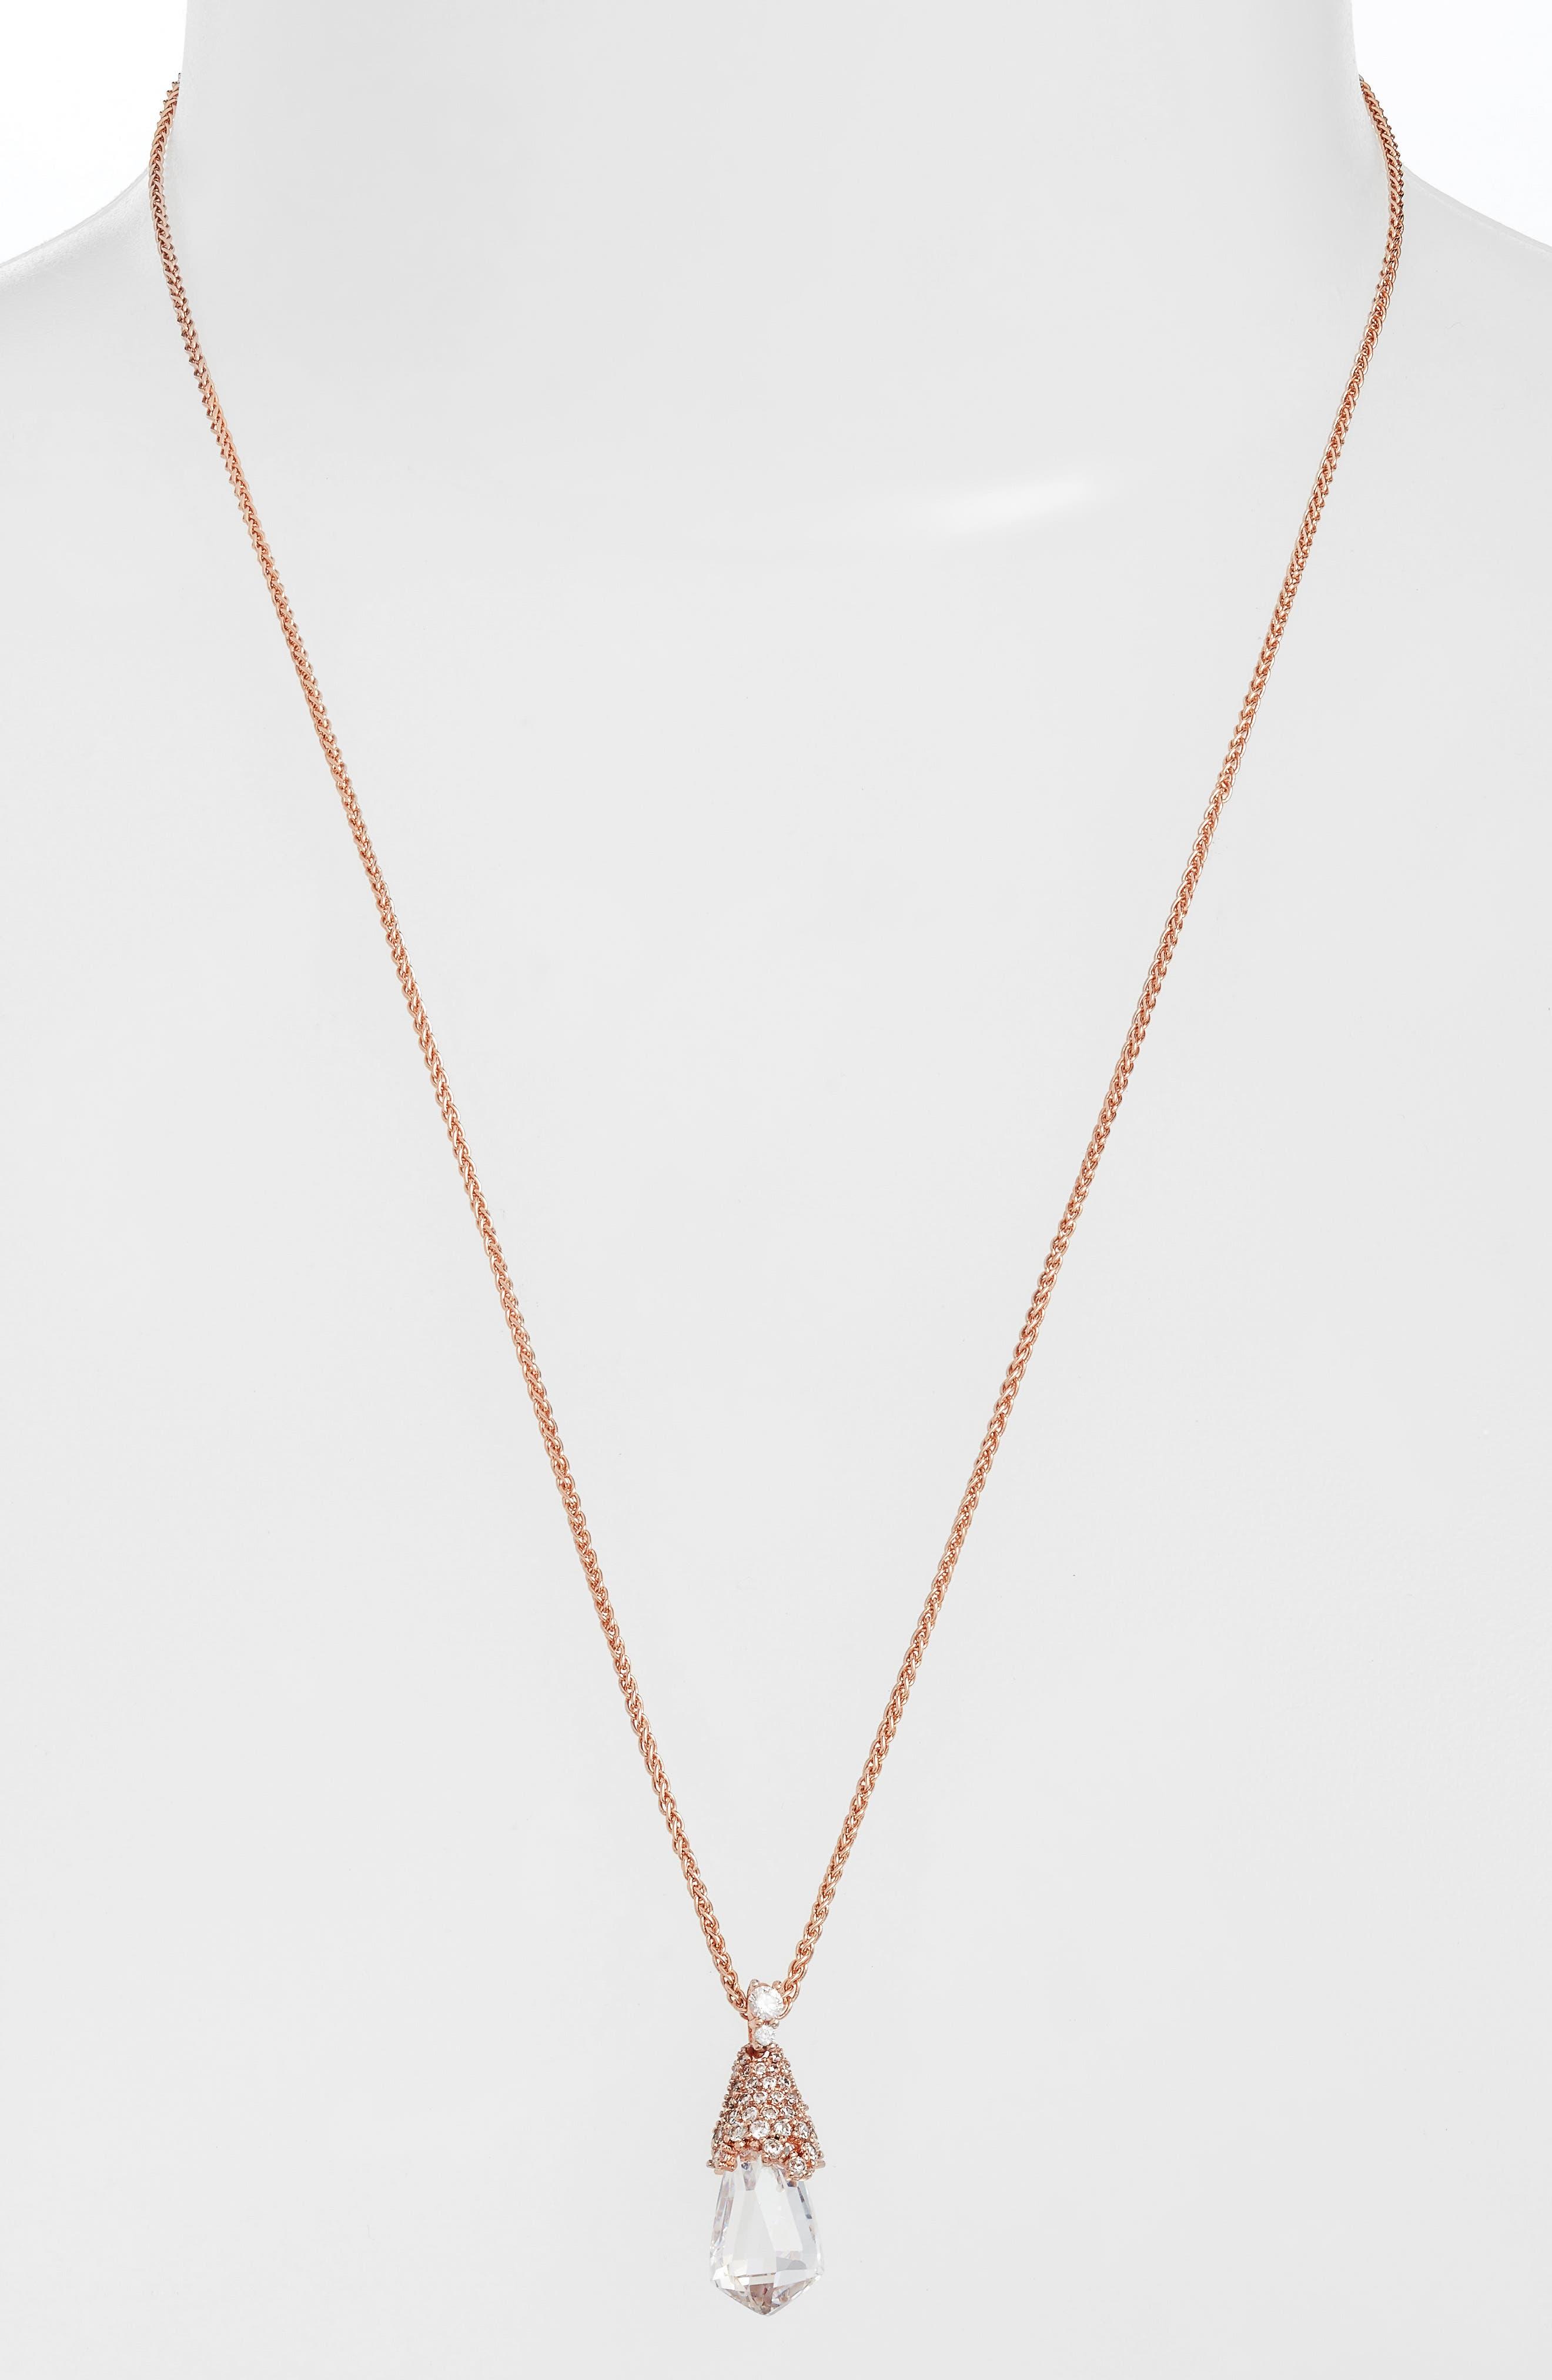 Kendra Scott Ella Convertible Teardrop Pendant Necklace